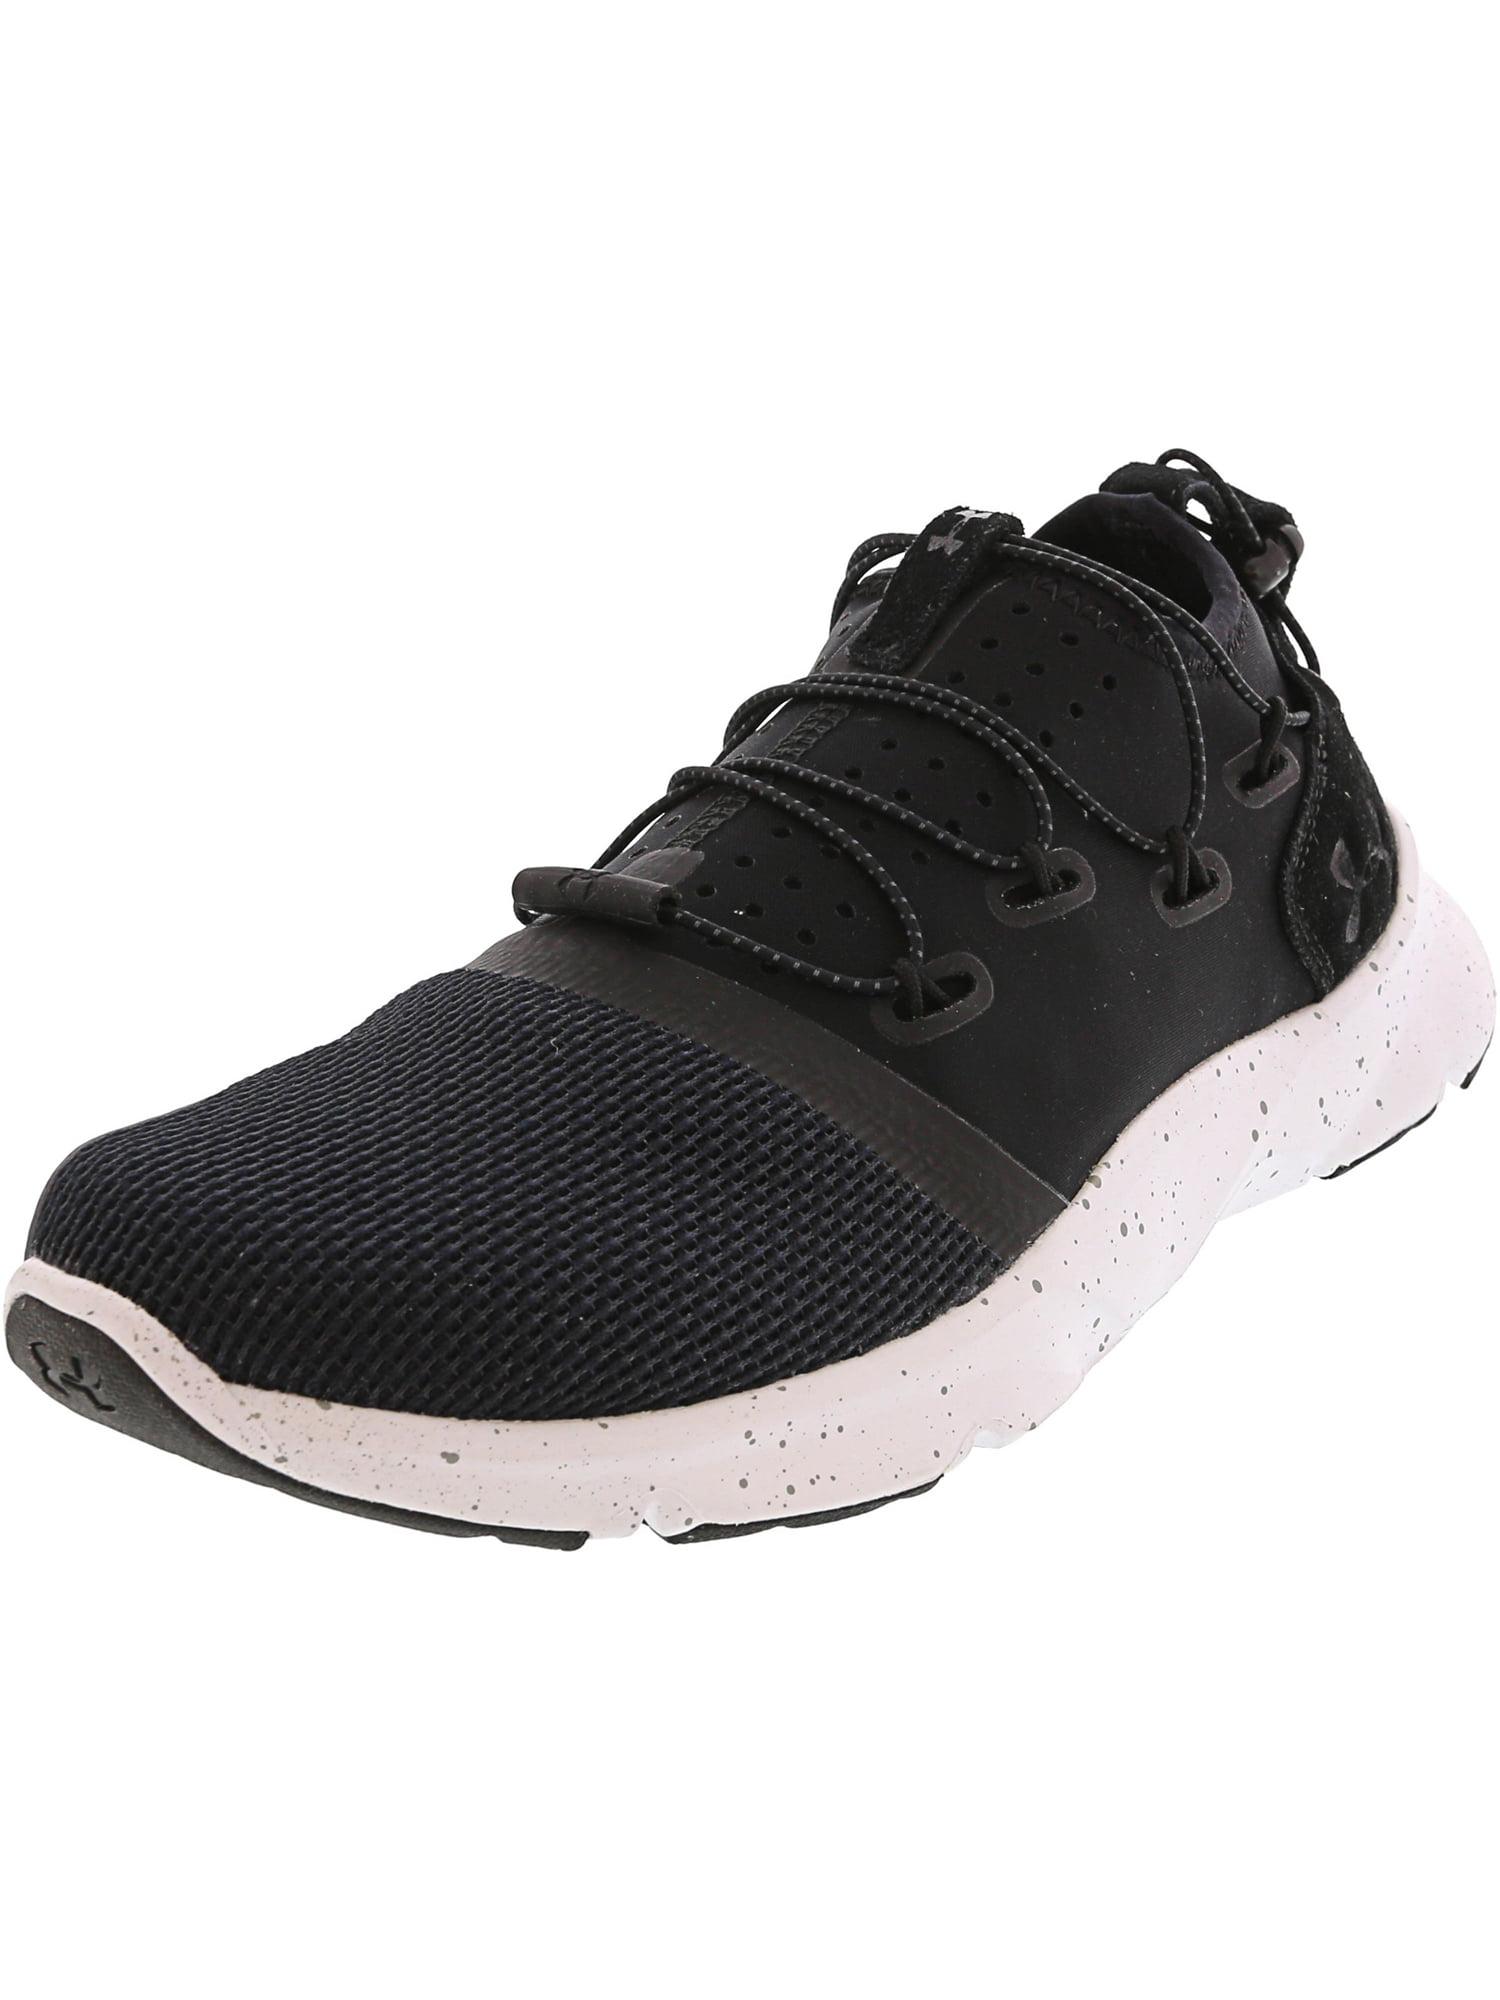 White Ankle-High Fashion Sneaker - 6.5M